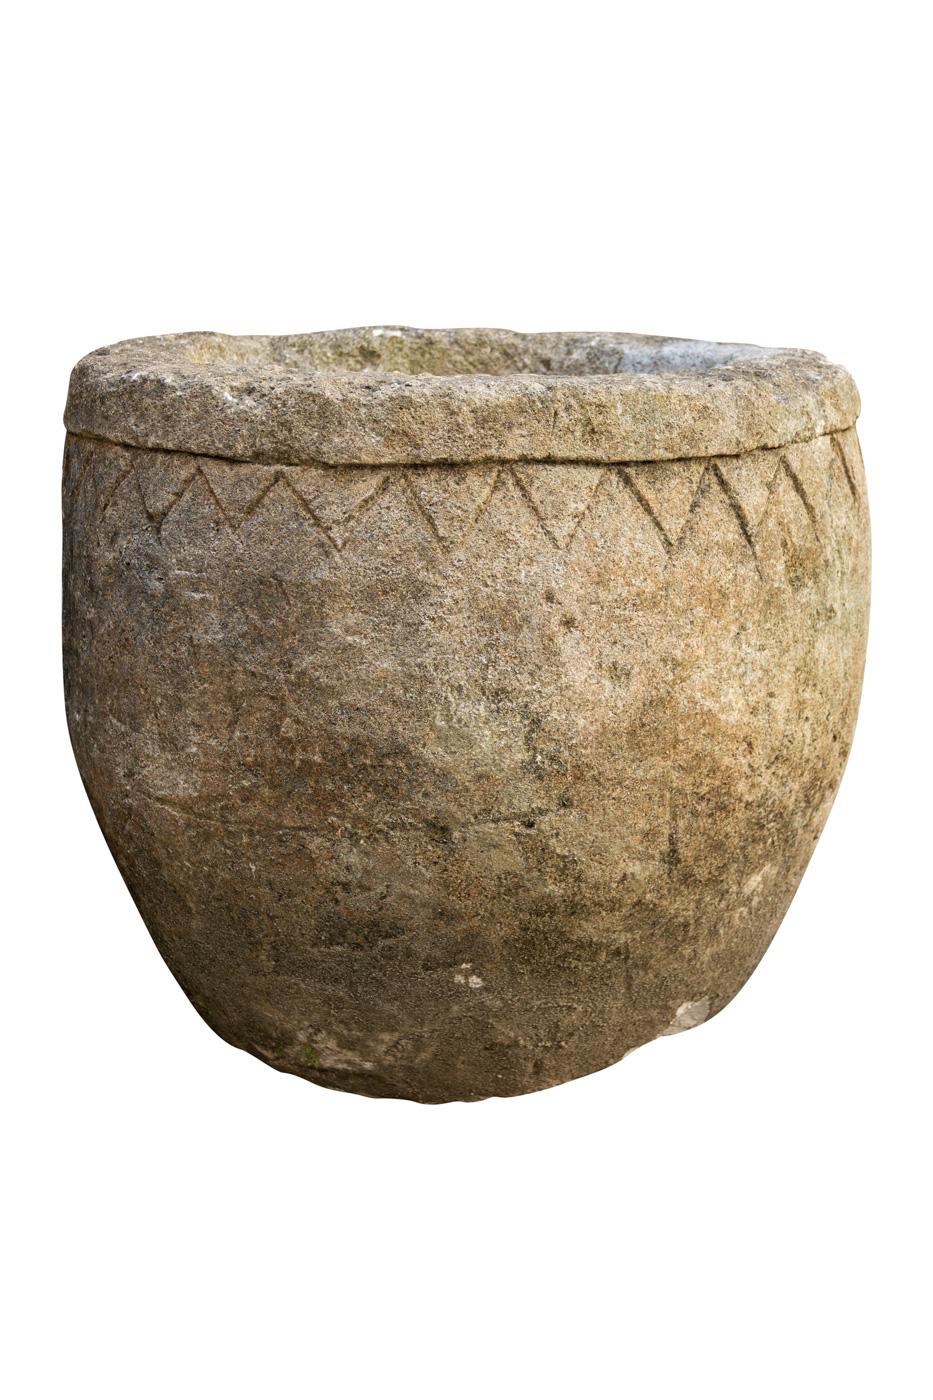 Matera de piedra Balinesa diseño rombos